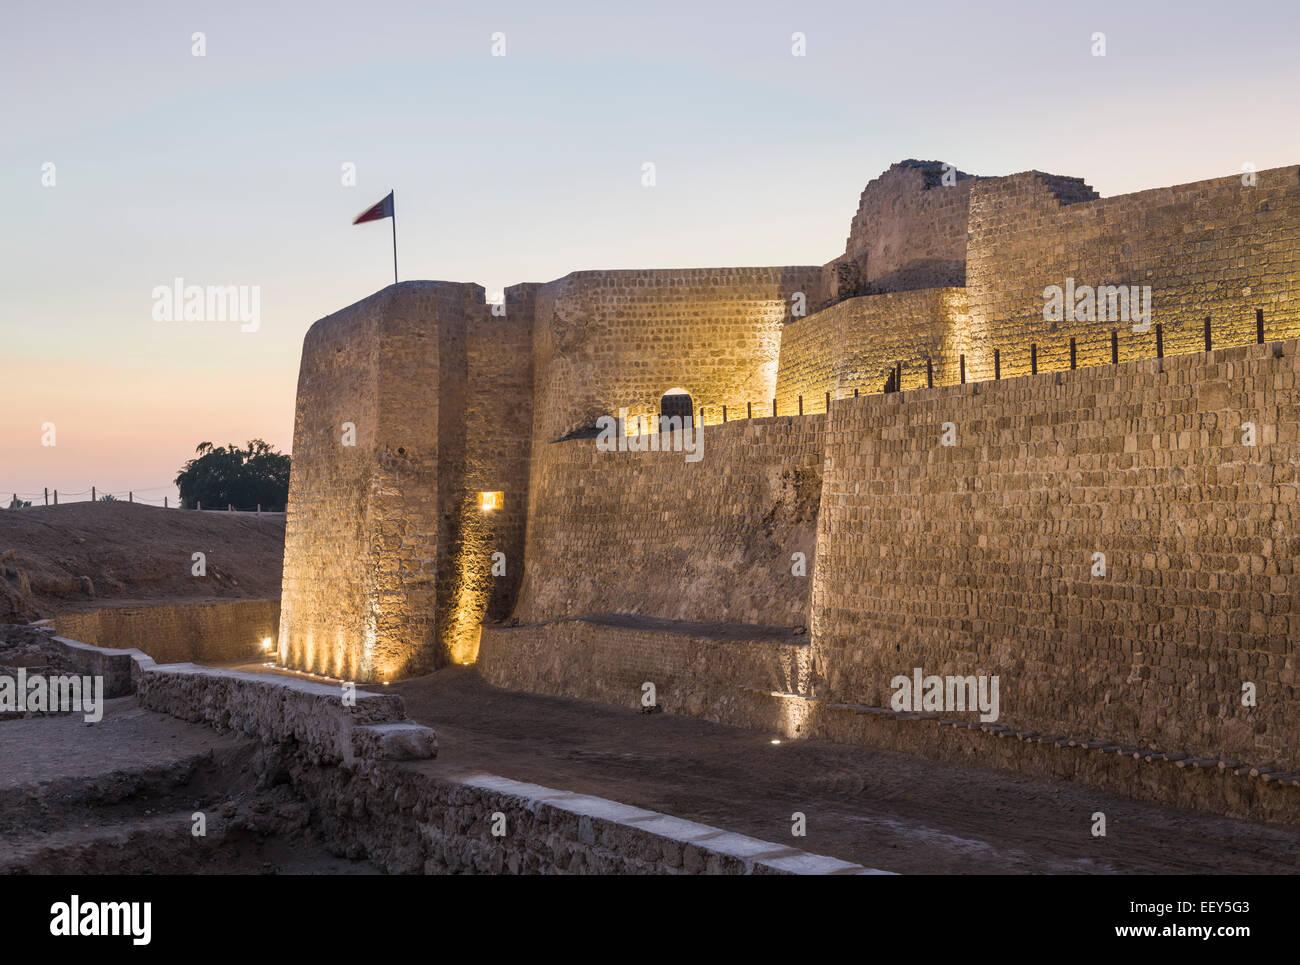 Sunset at Bahrain Fort near Manama at Seef, Bahrain - Stock Image